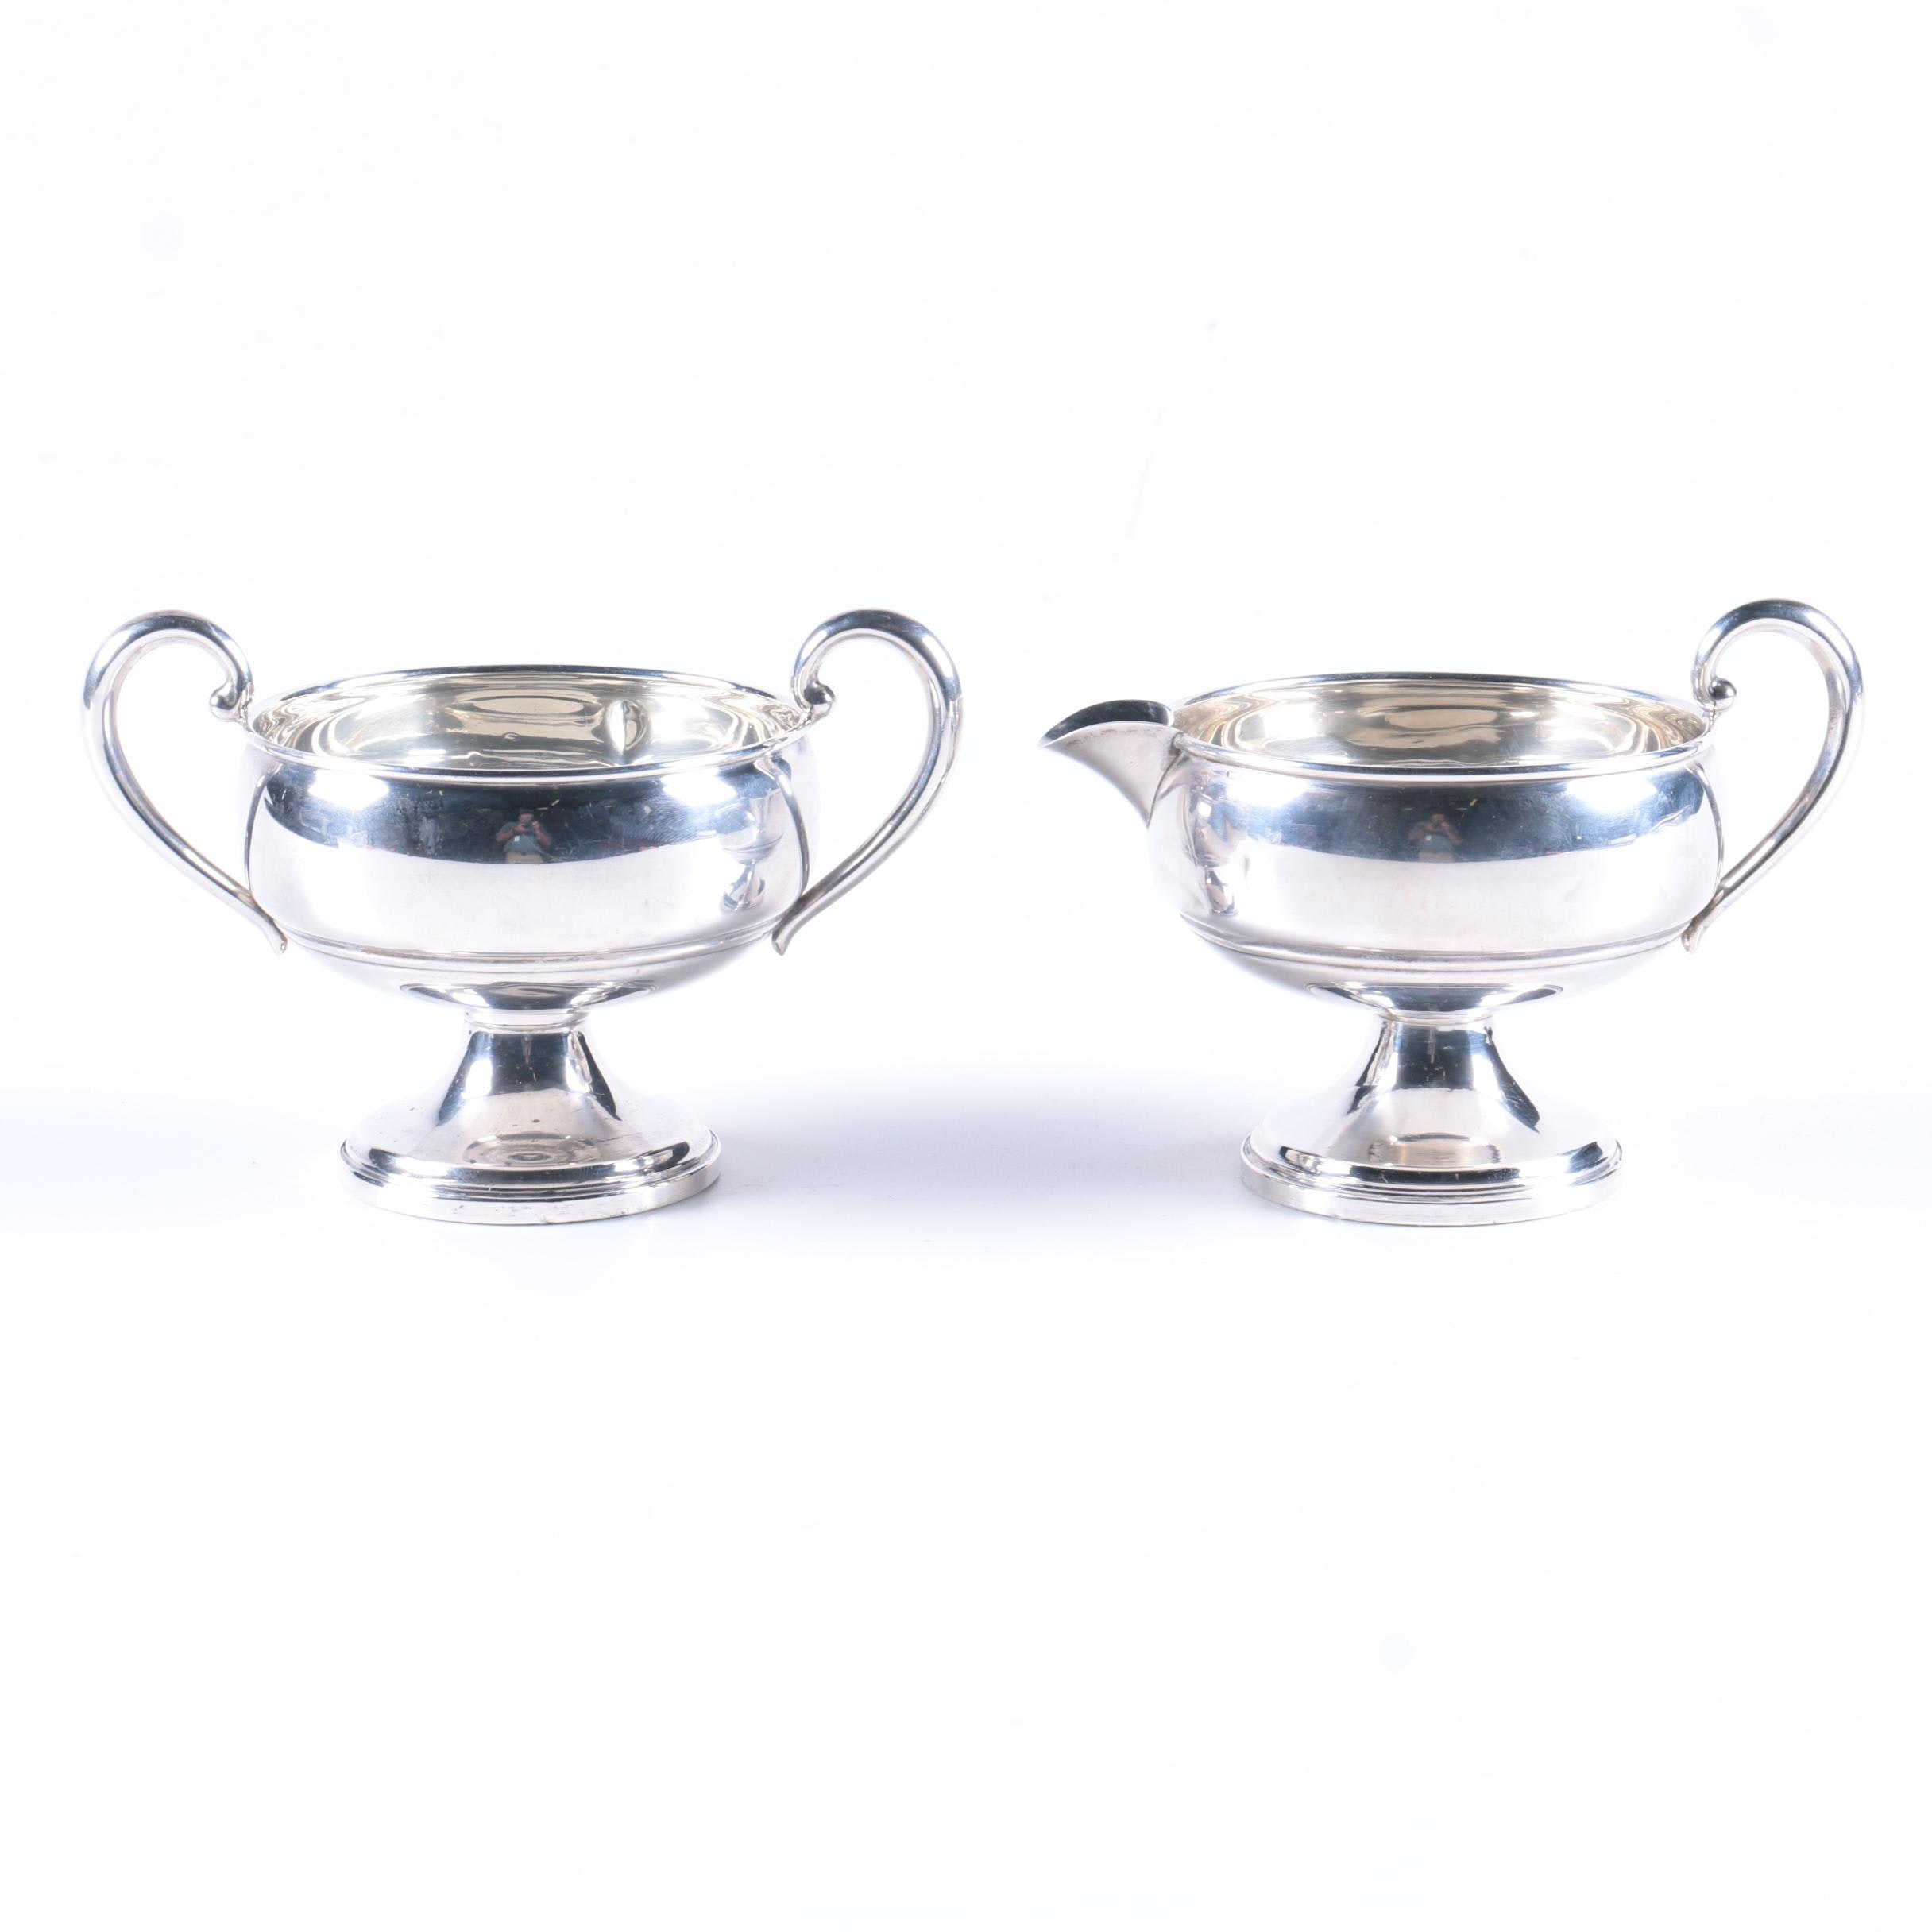 Revere Silversmiths Sterling Silver Creamer and Sugar Bowl Set